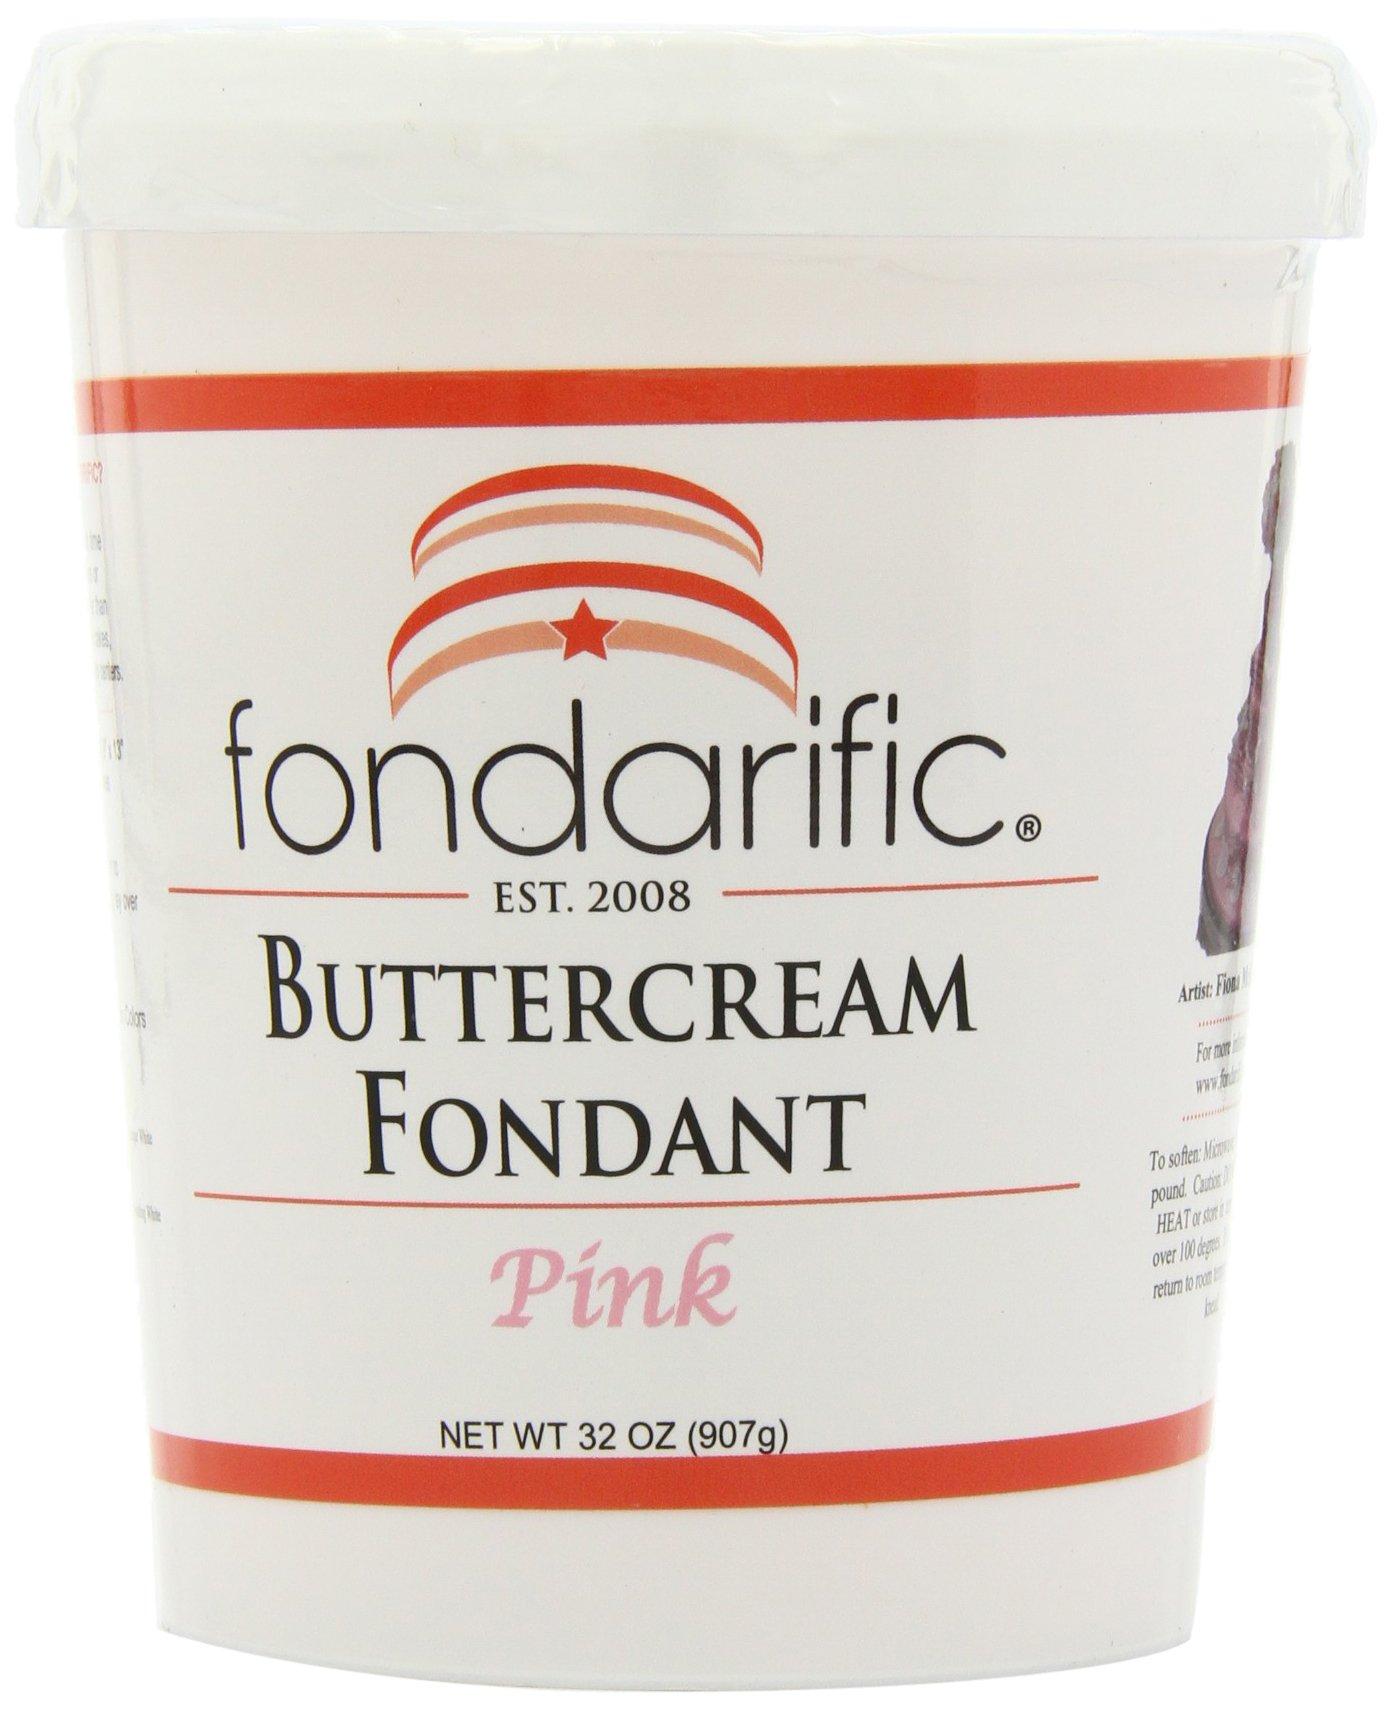 Fondarific Buttercream Pink Fondant, 2-Pounds